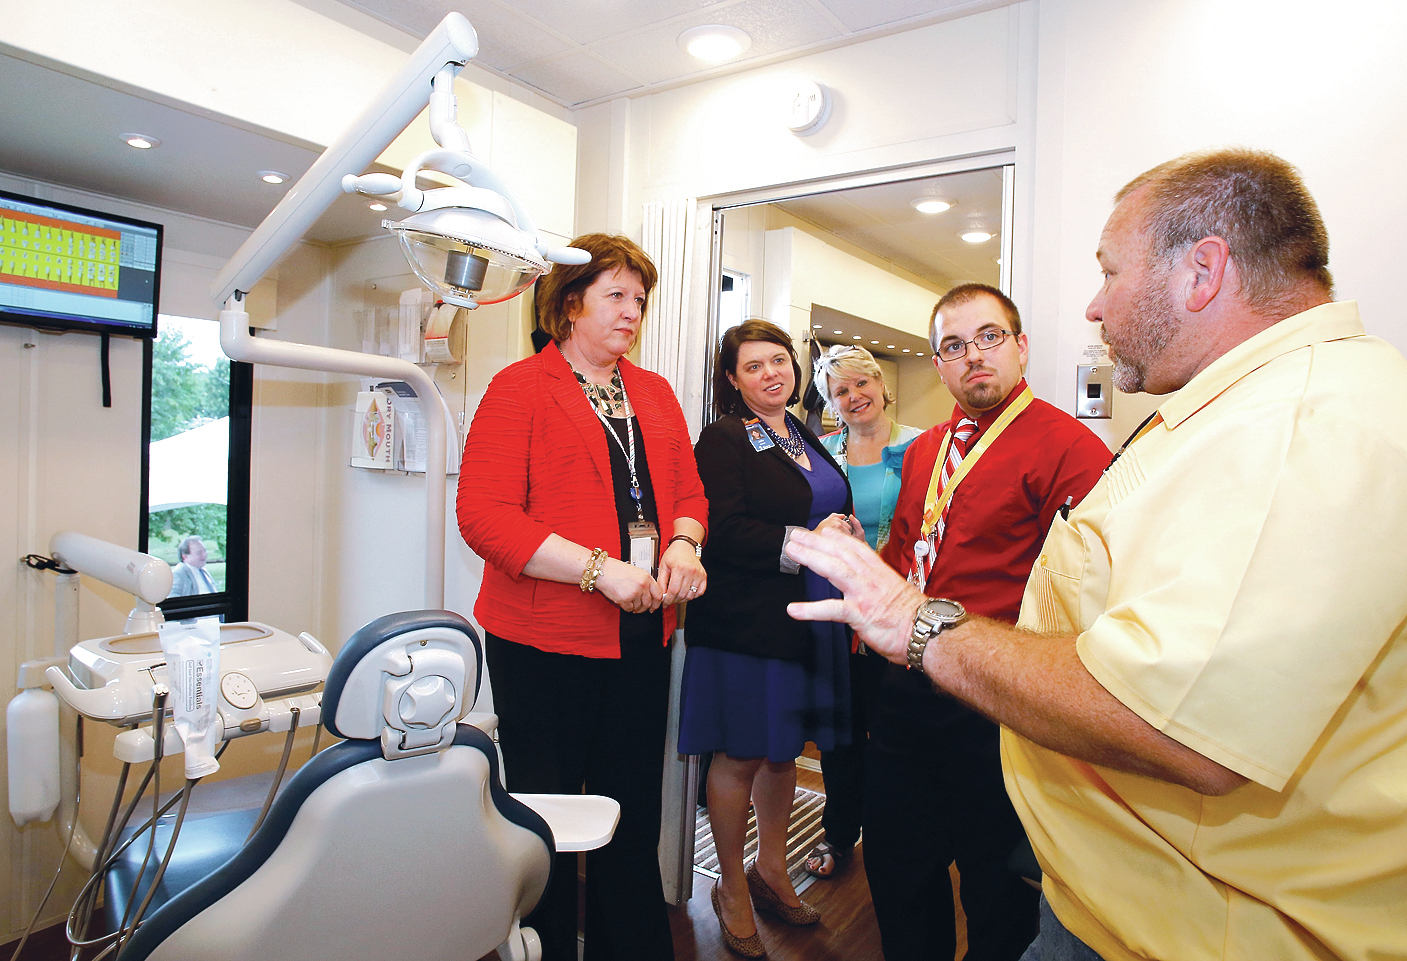 washington regional unveils mobile dental clinic  walmart